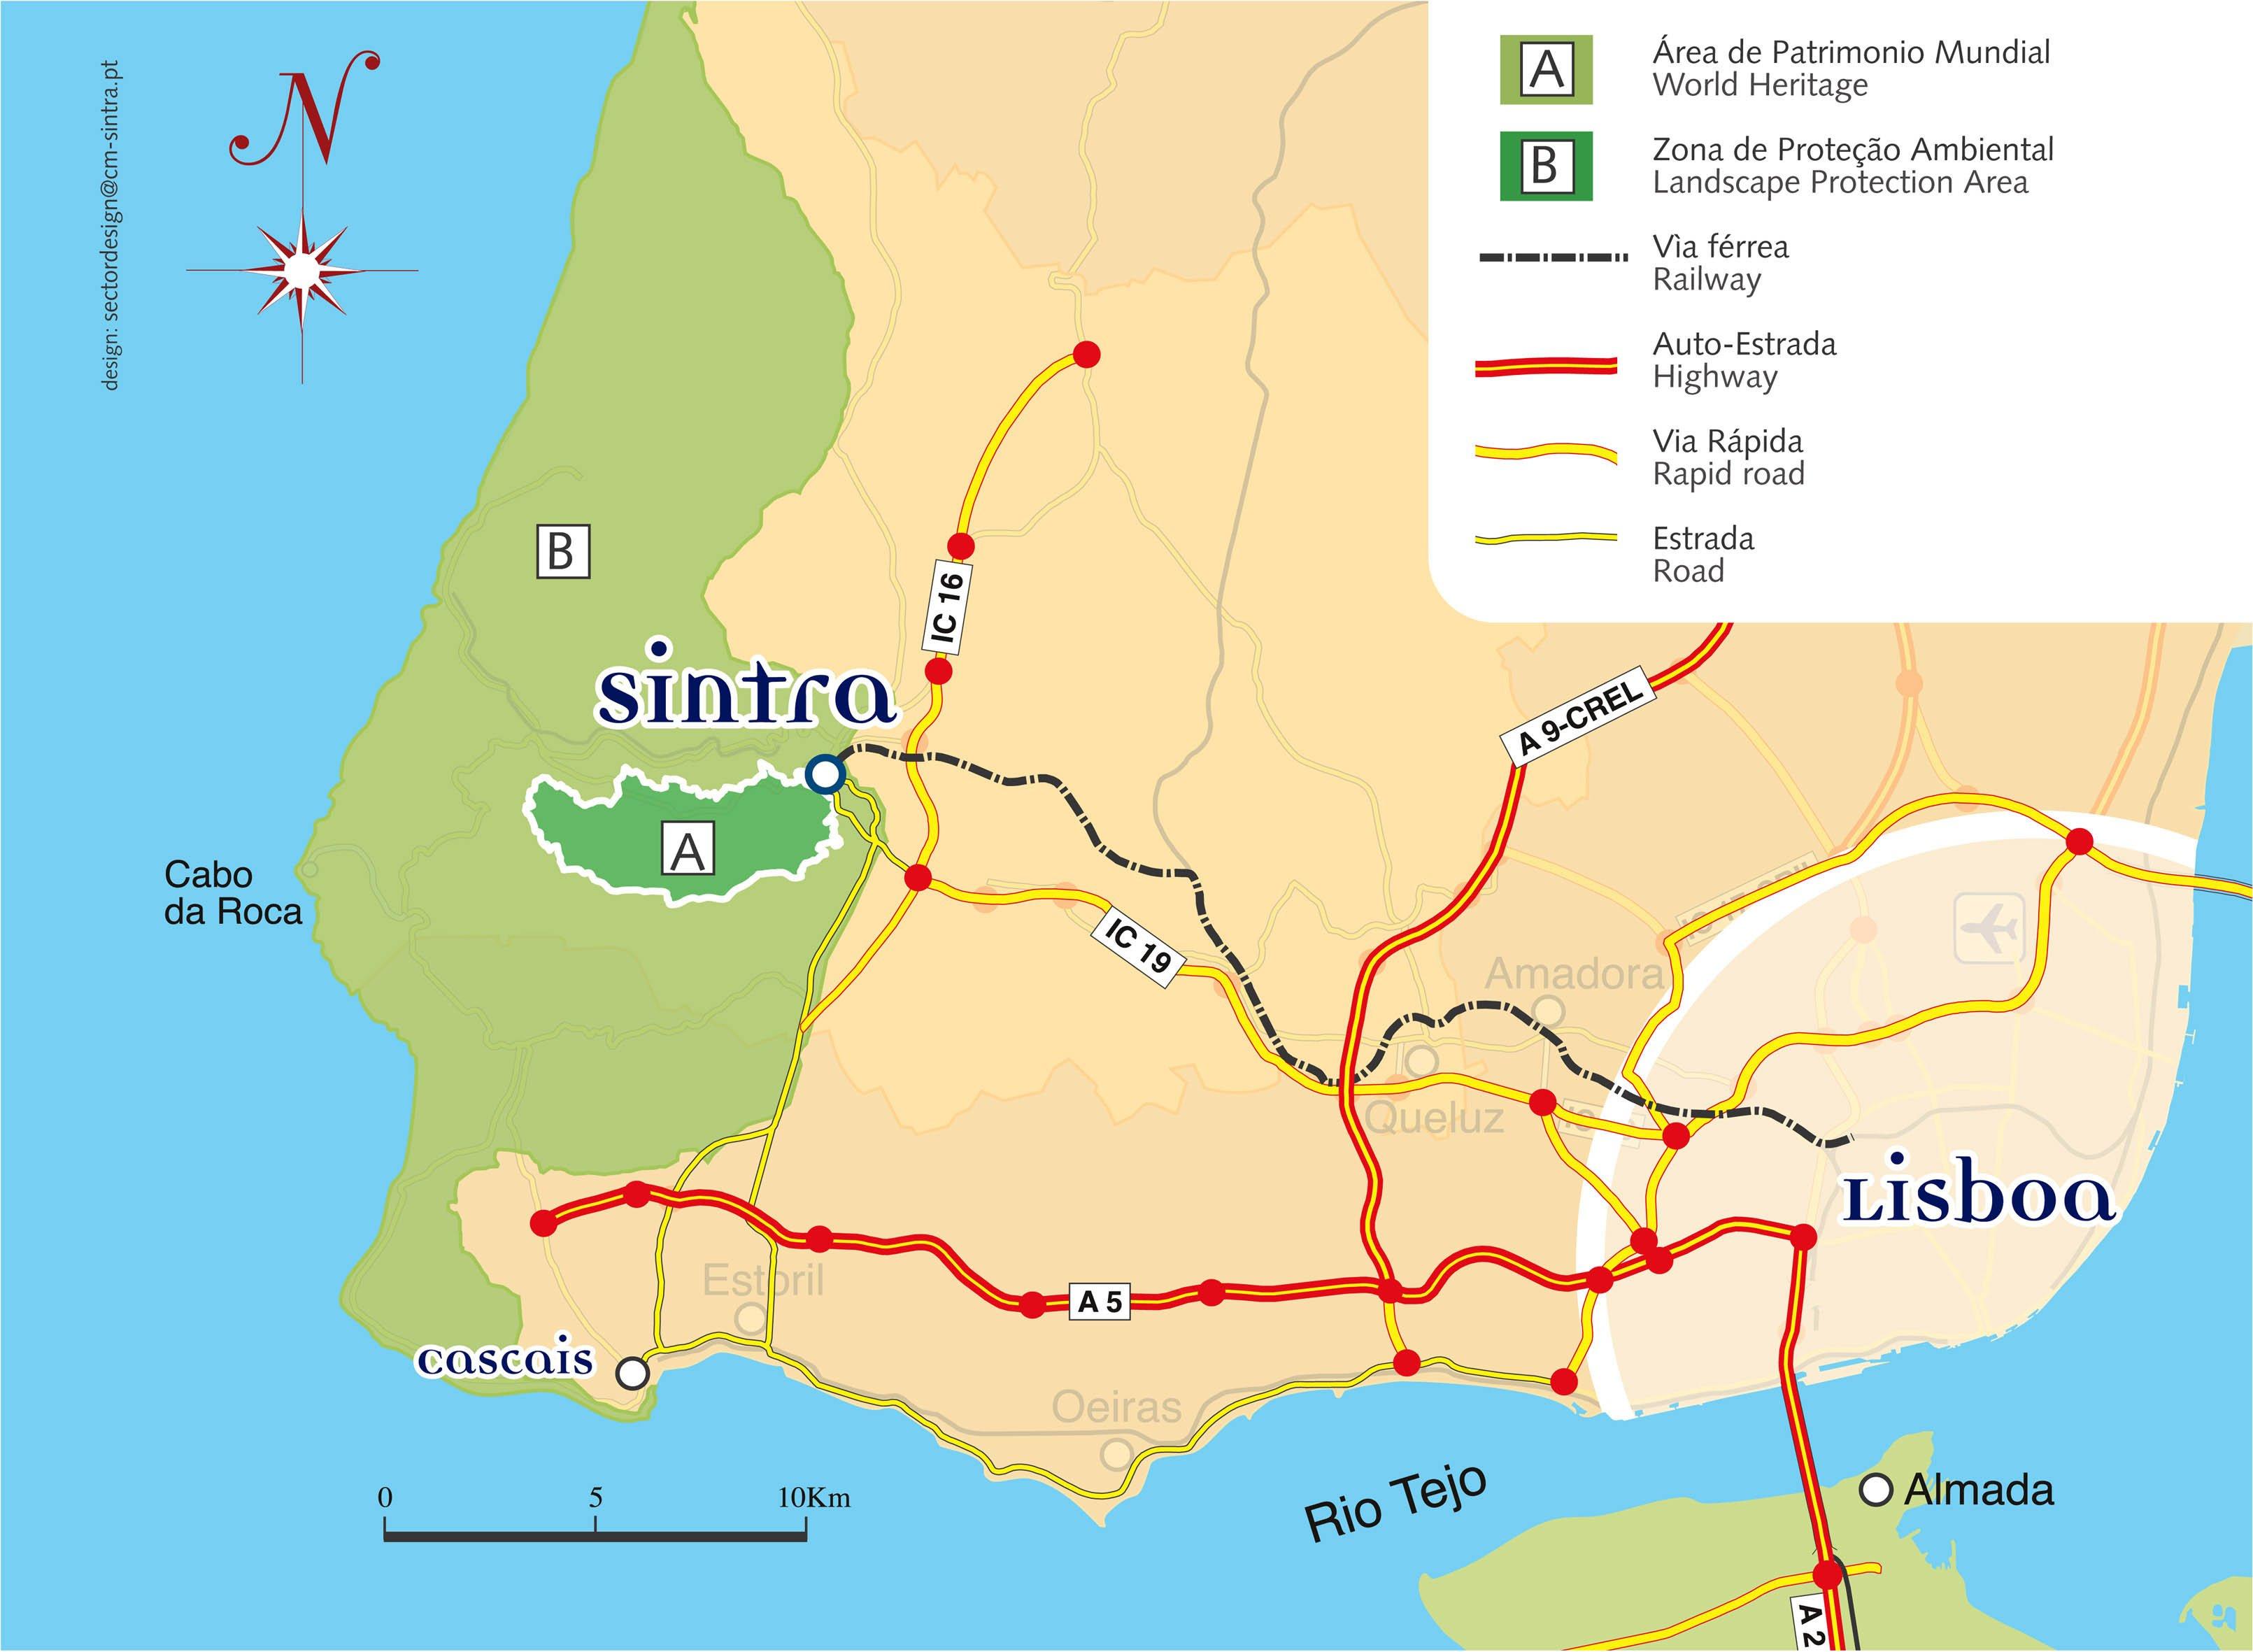 mapa lisboa sintra Património Mundial   PATRIMONIO   Câmara Municipal de Sintra mapa lisboa sintra